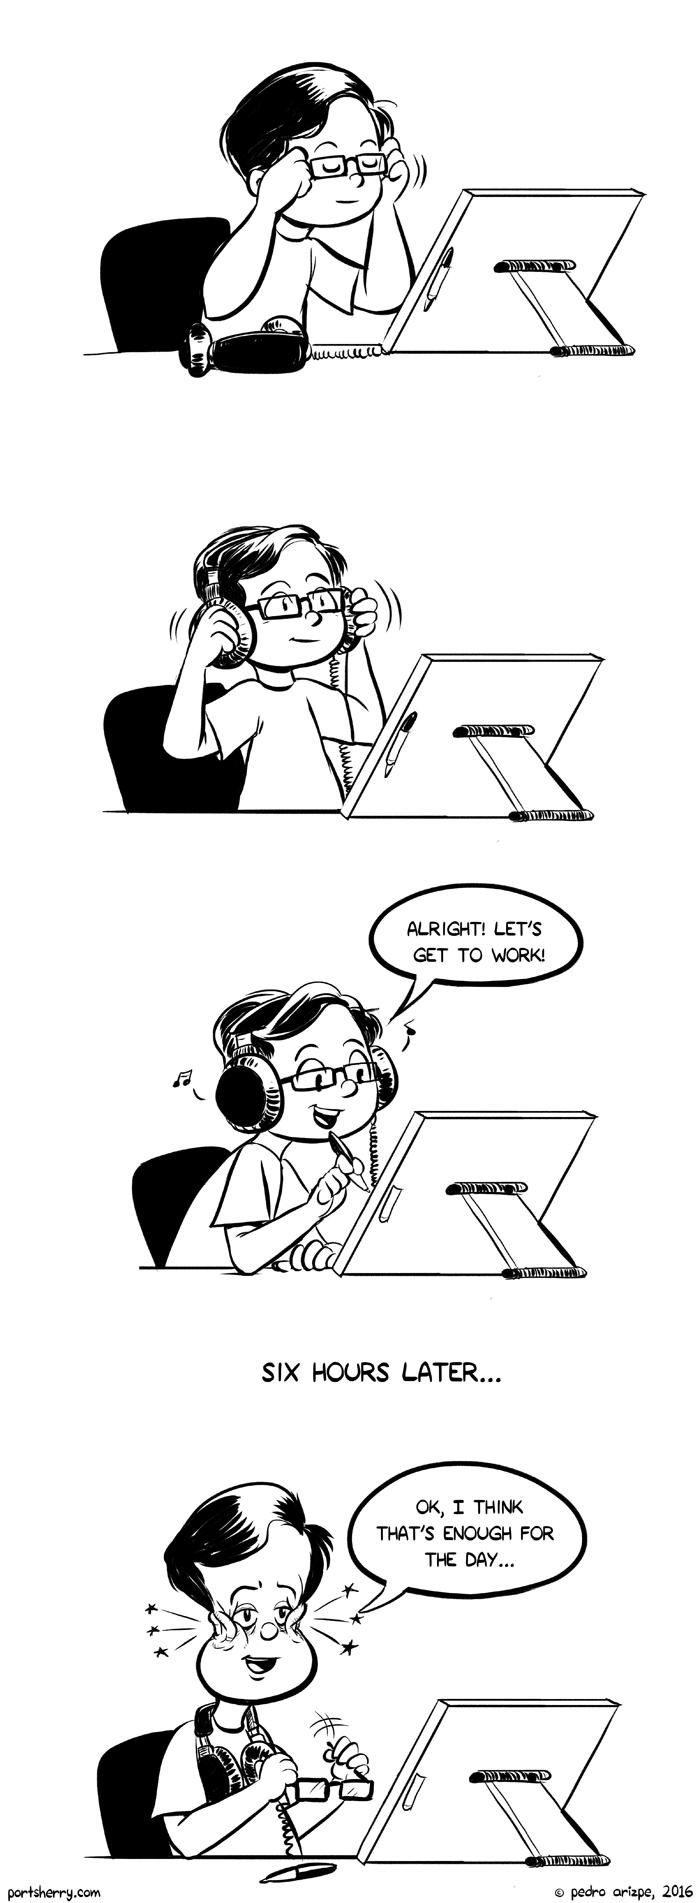 web-comics-when-you-wear-headphones-glasses-same-time-horrible-pain